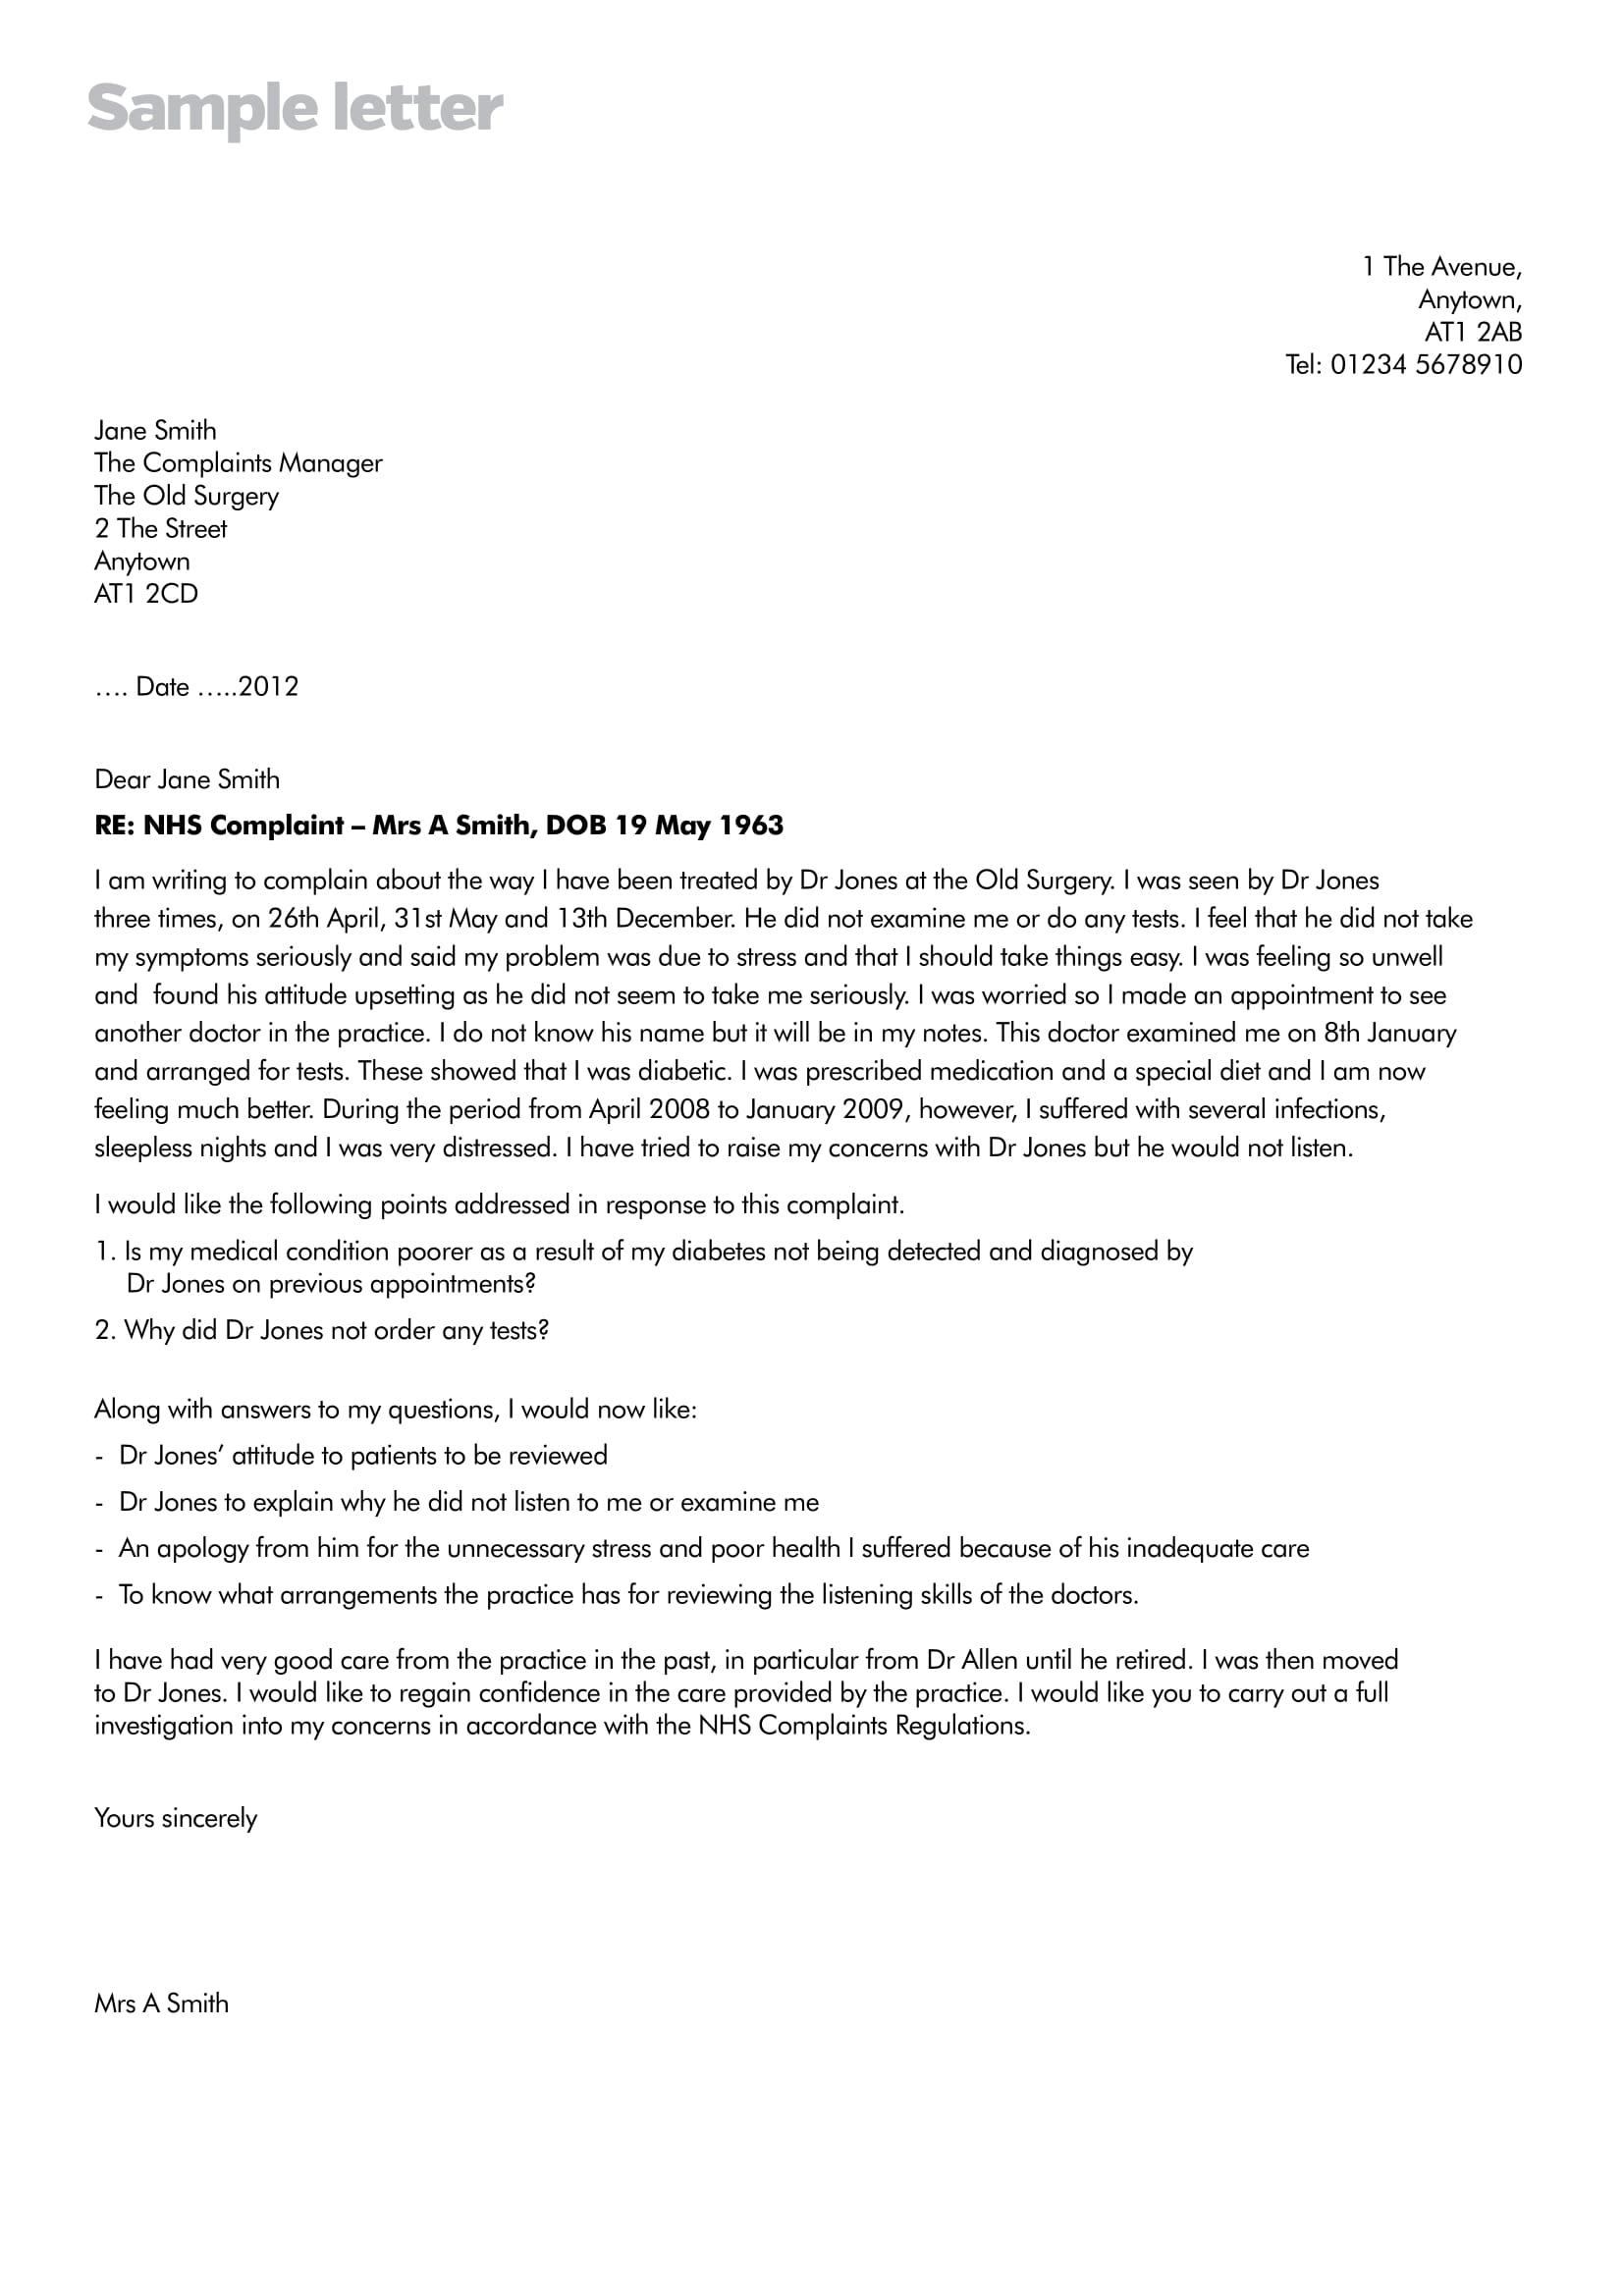 19 complaint letter examples pdf complaint letter example spiritdancerdesigns Image collections